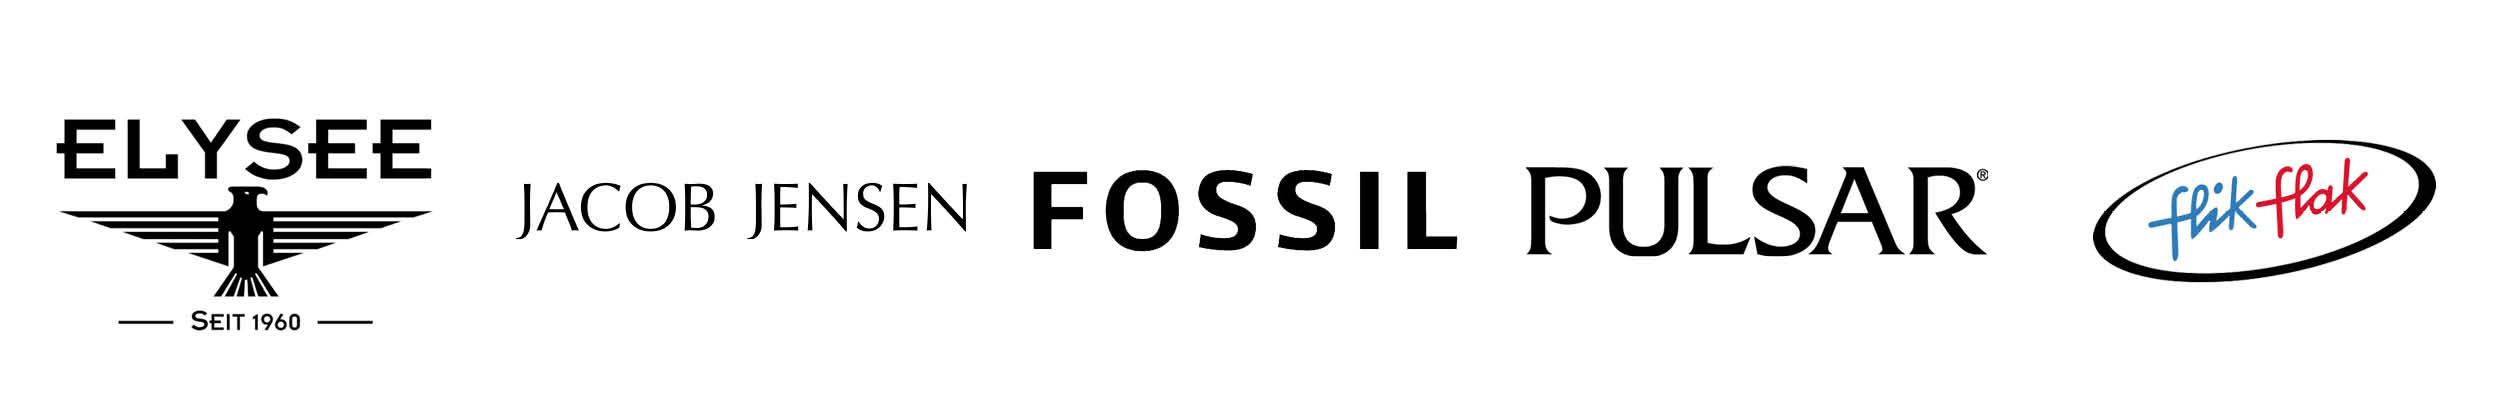 logo merken4